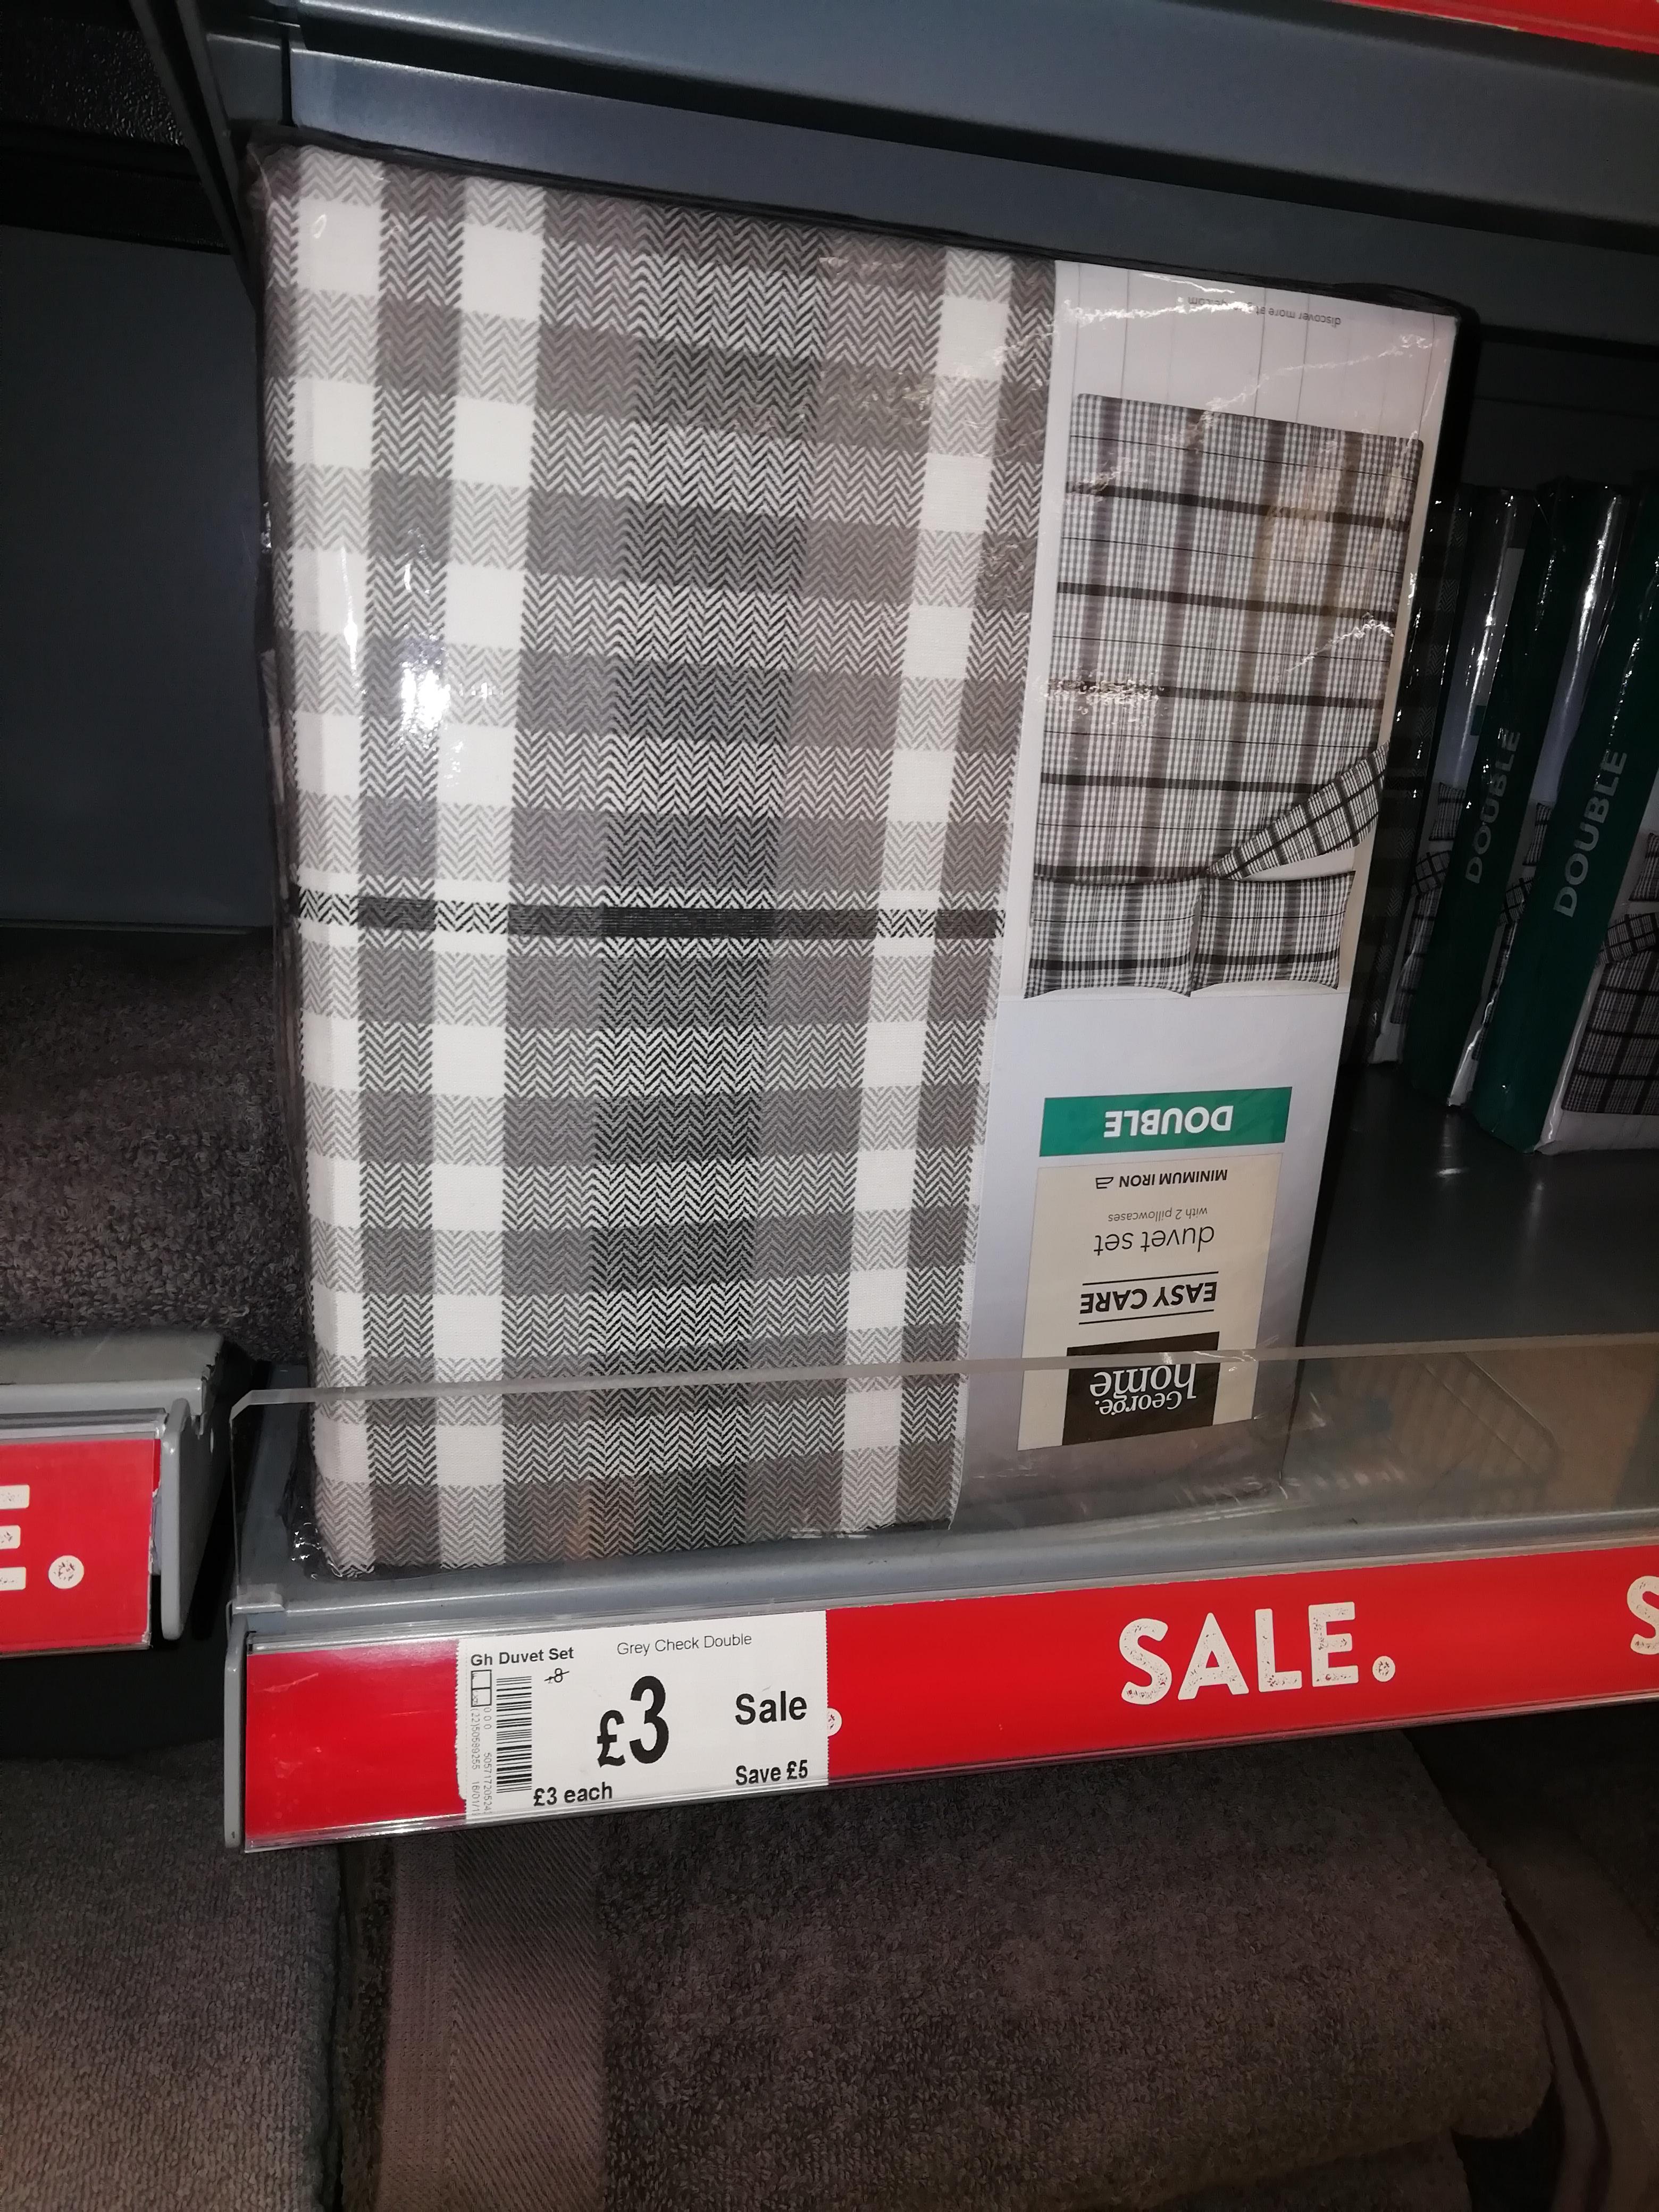 Grey Check double duvet set @ asda £3.00 instore